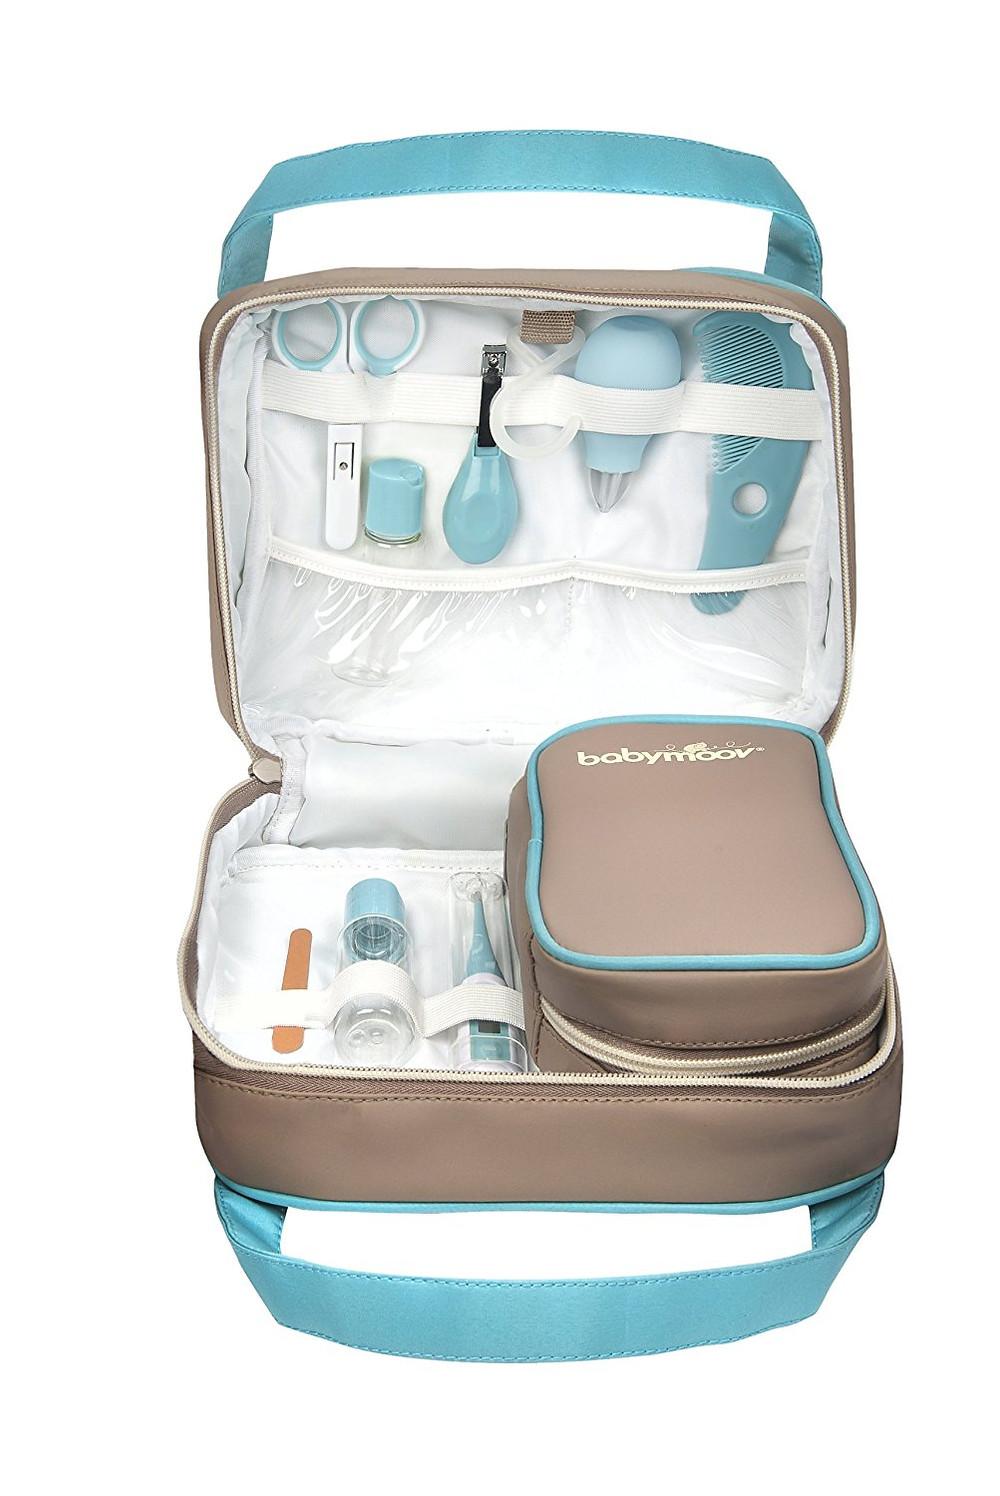 kit de soins babymoov